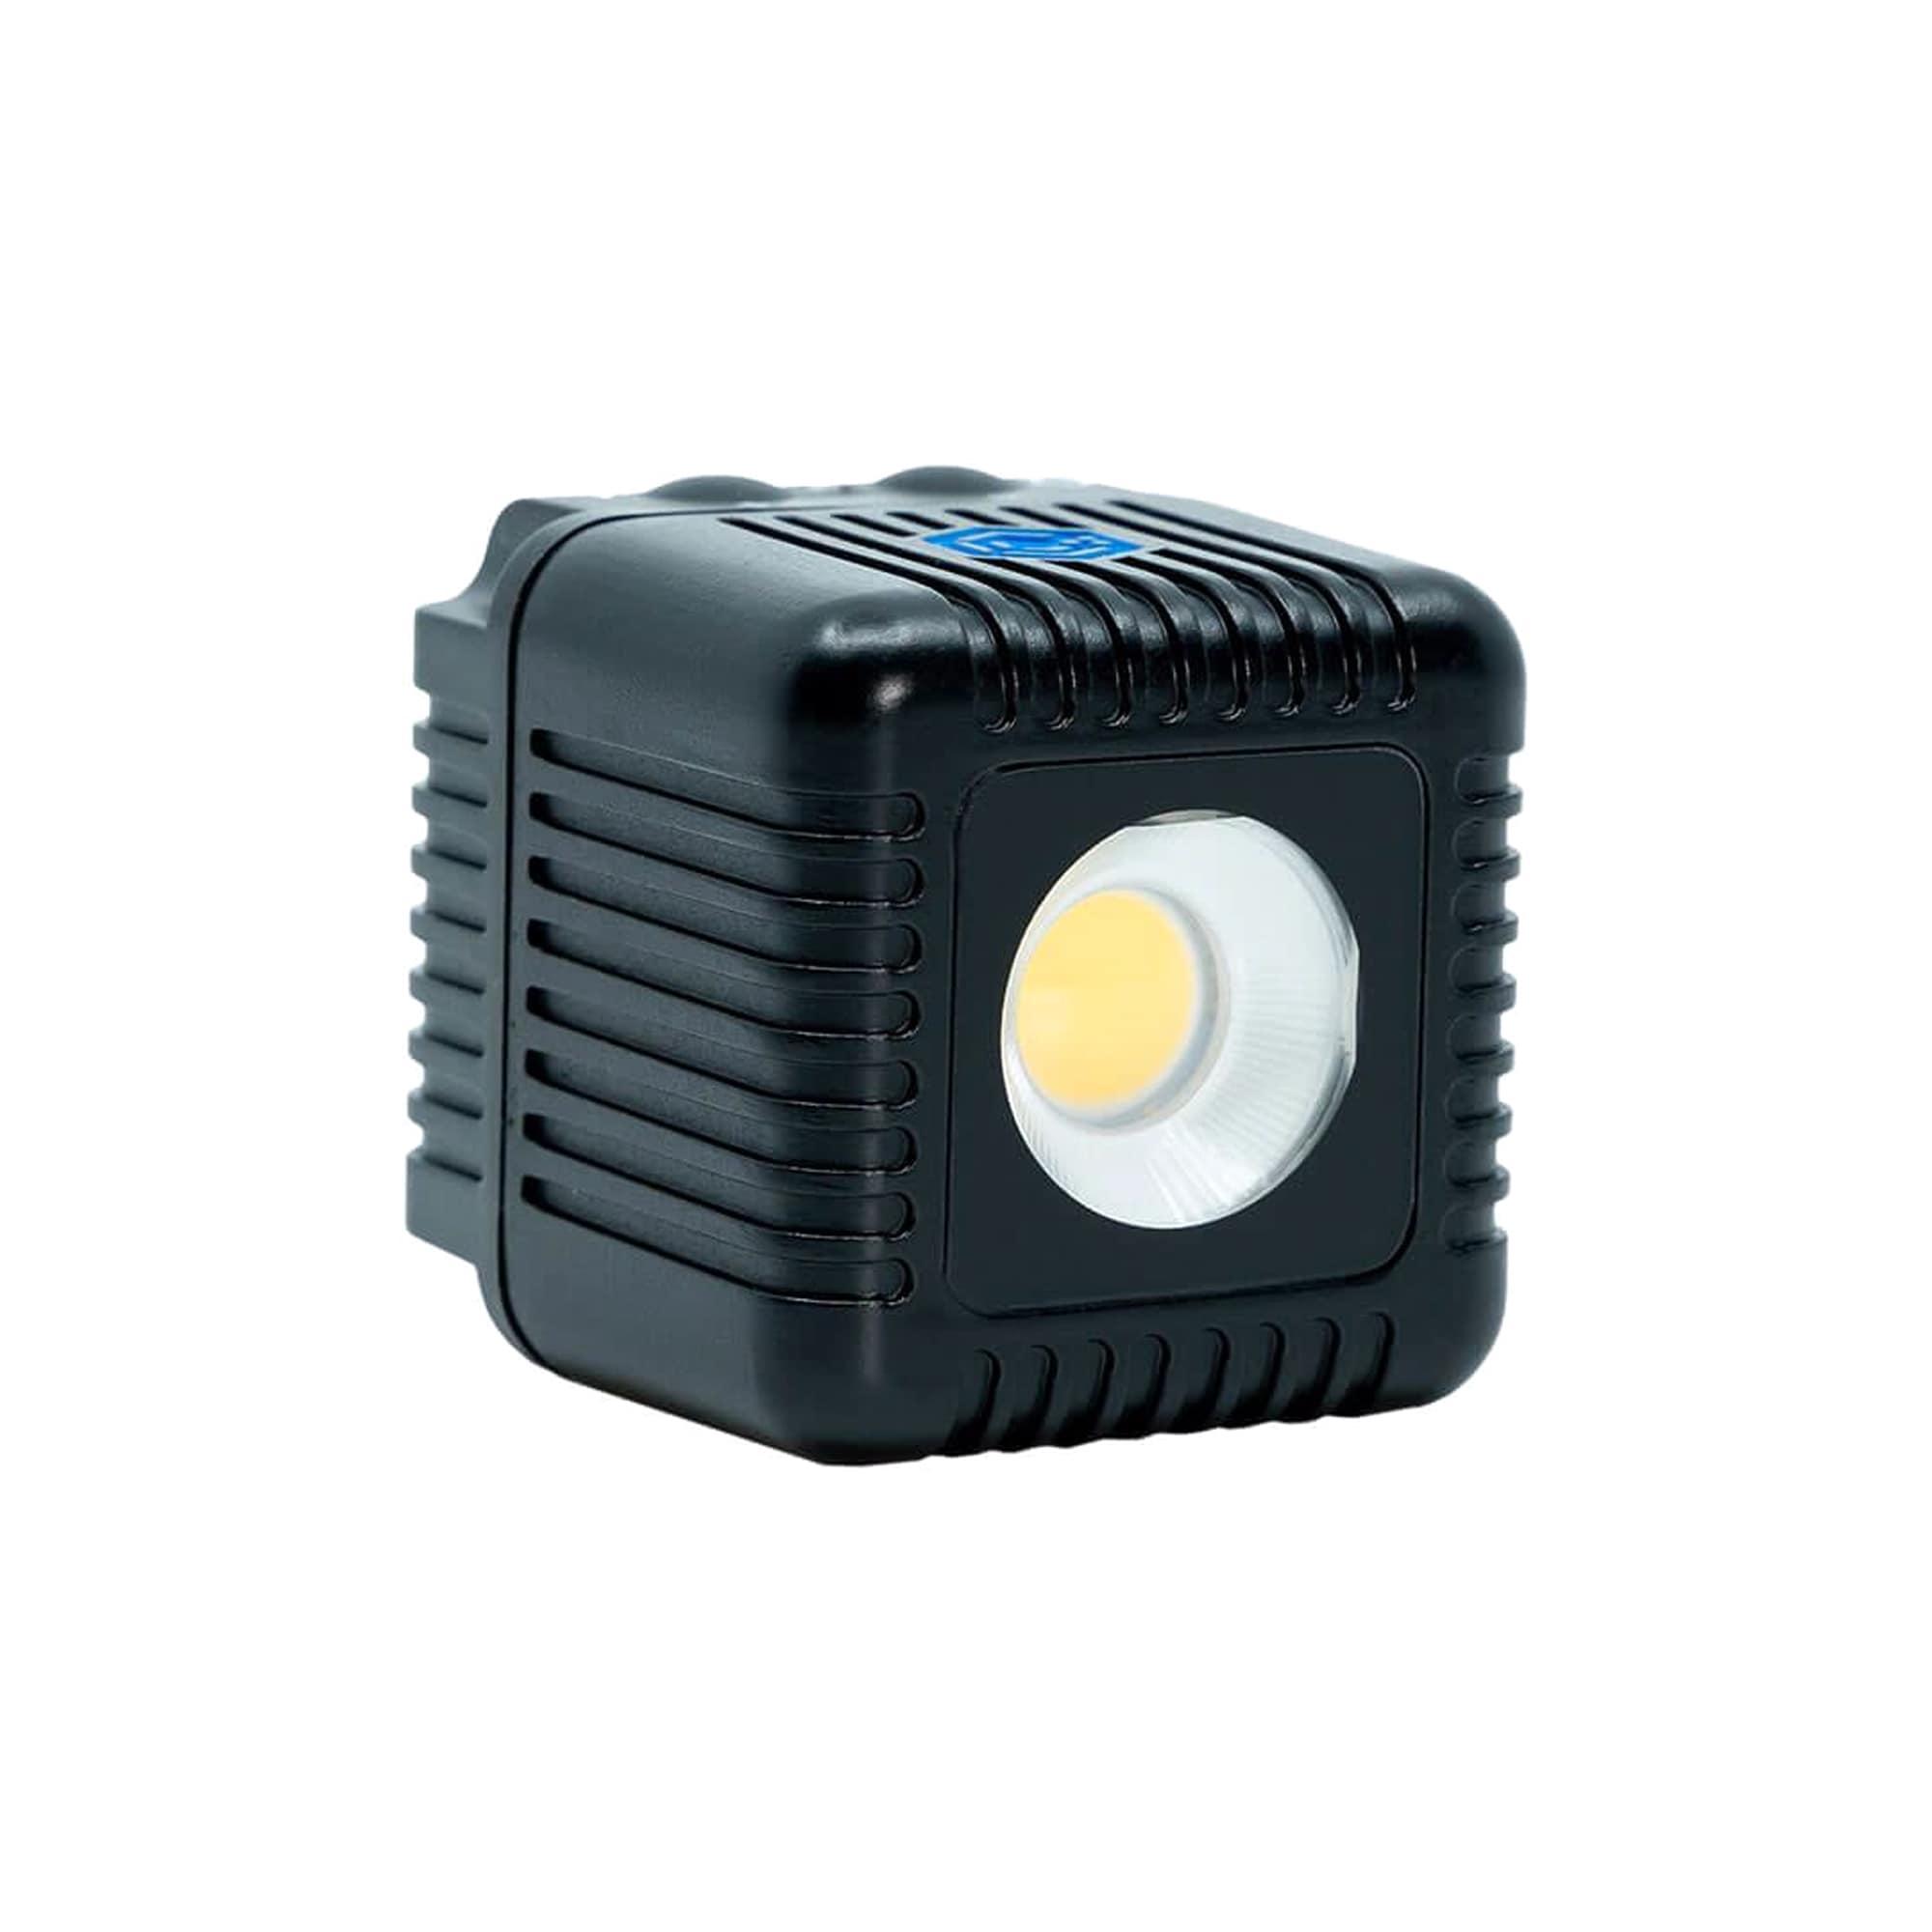 Ricoh GR III + Lume Cube 2.0